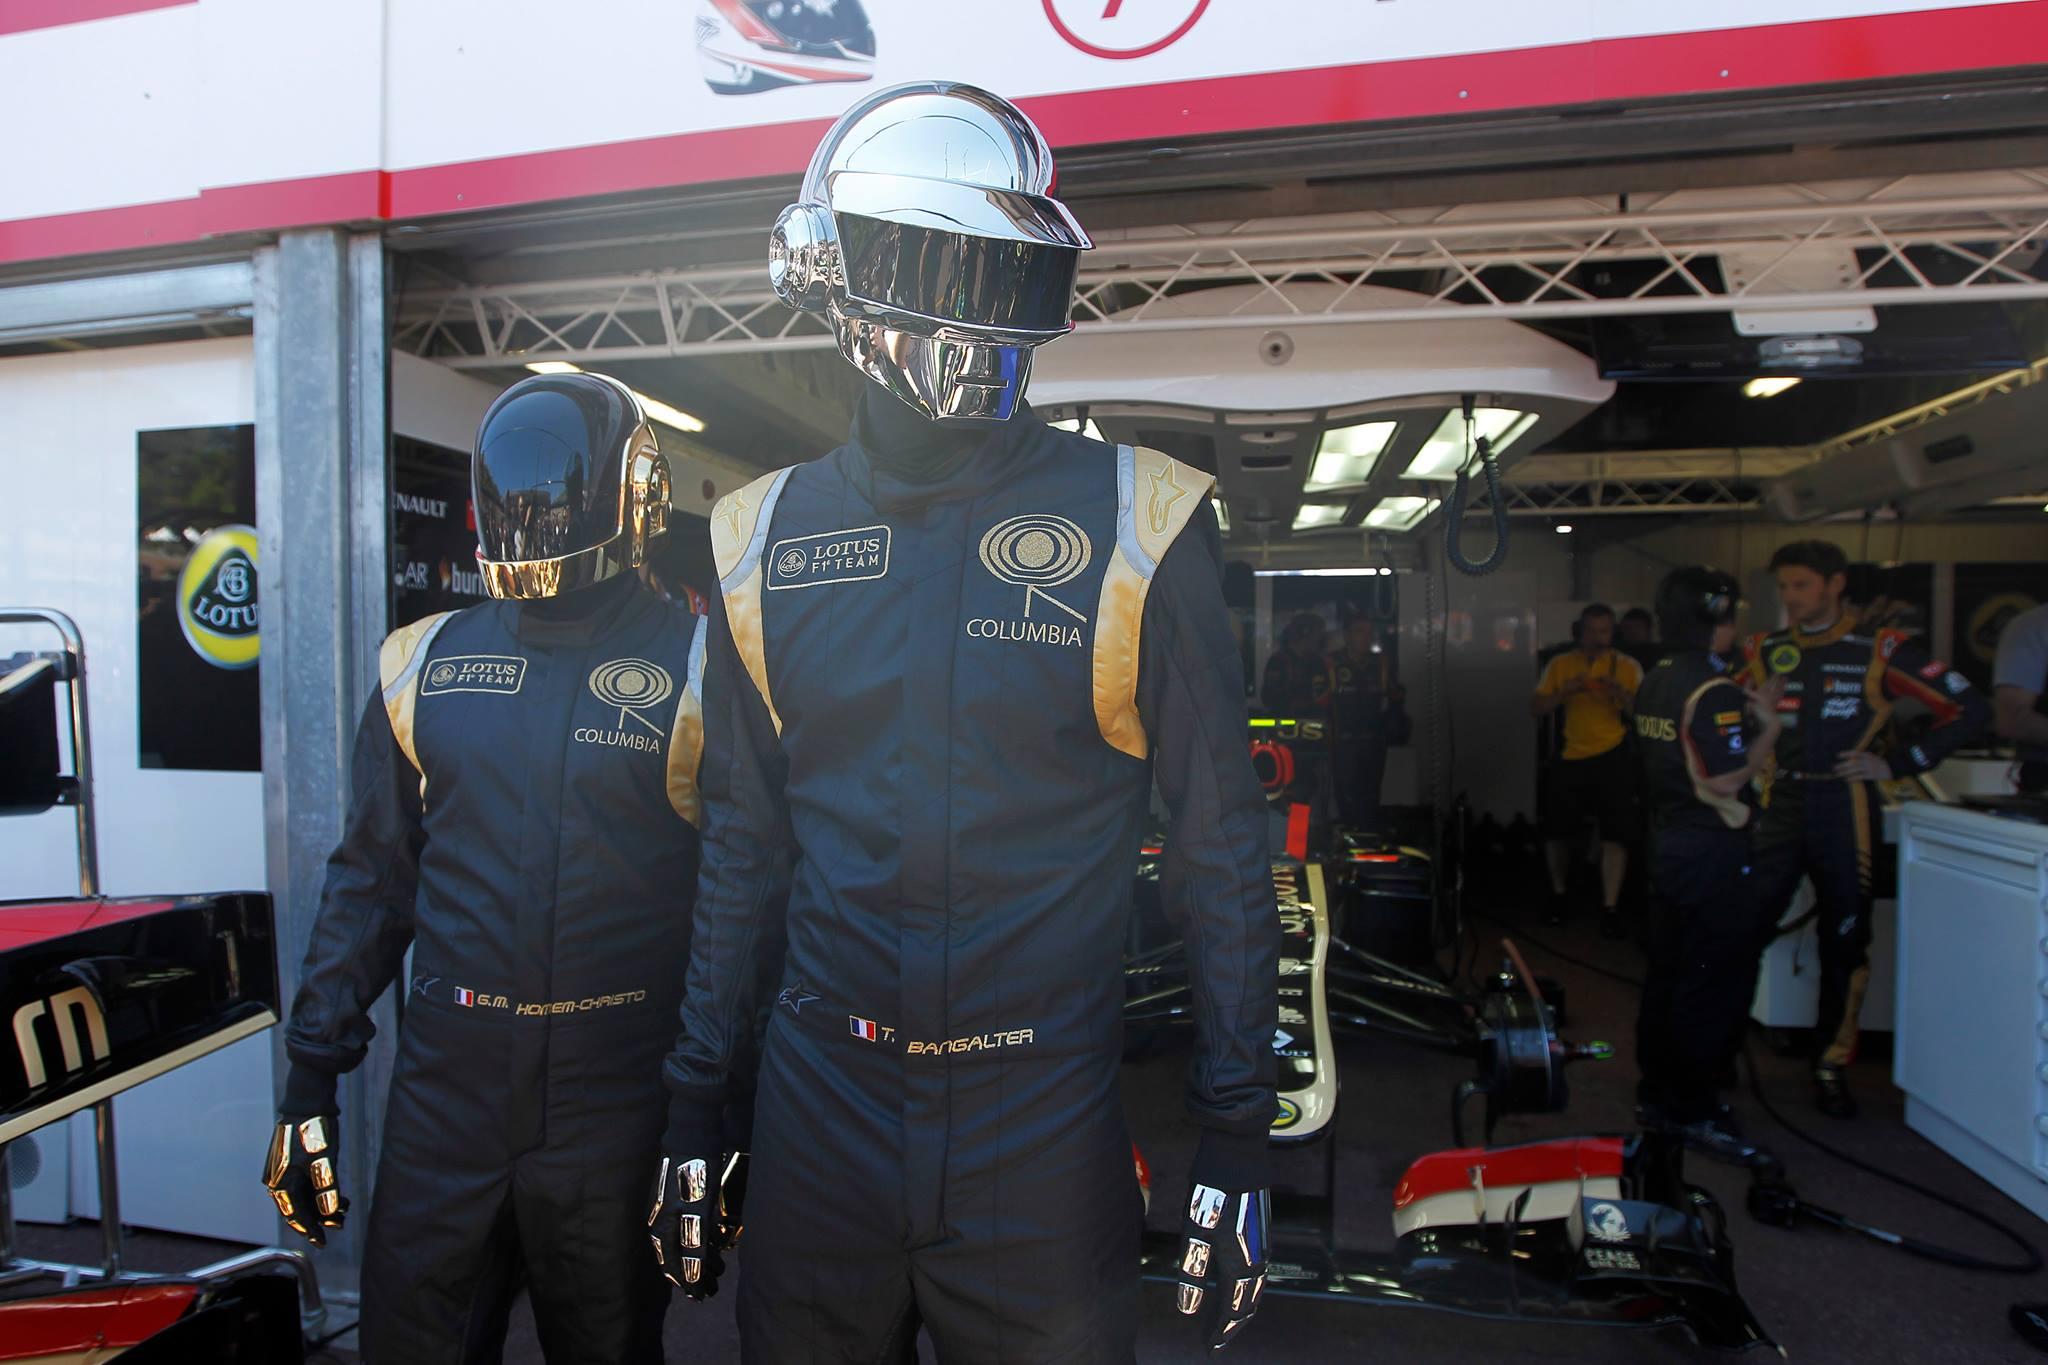 Wallpaper Vehicle Celebrity Formula 1 Daft Punk Person